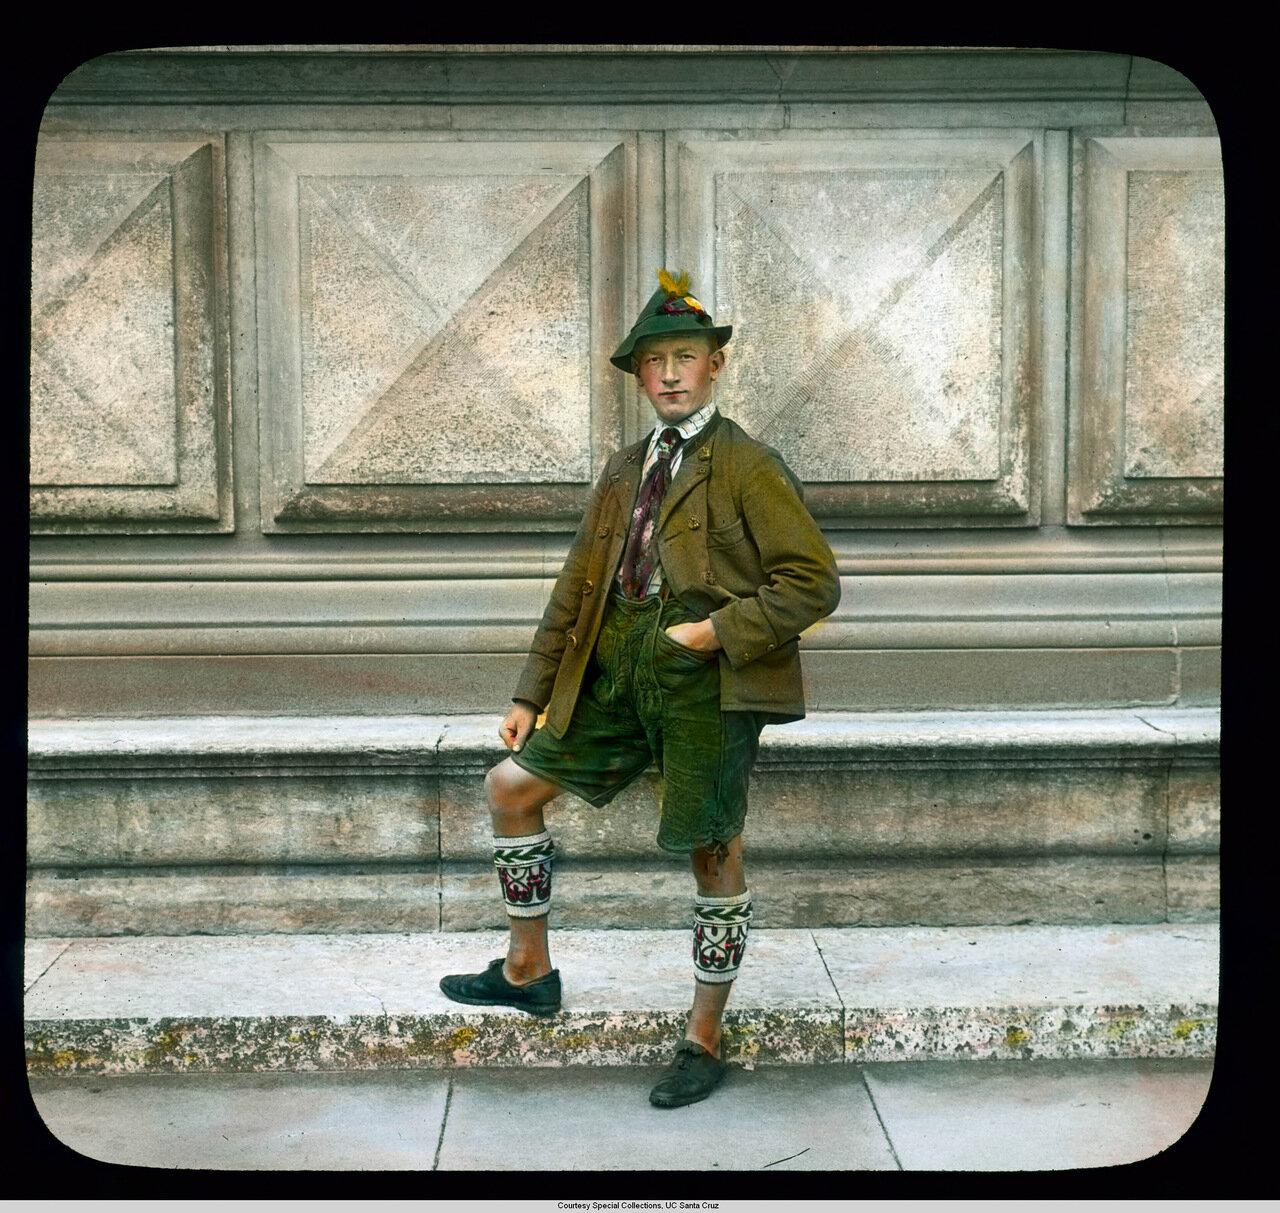 Бавария. Мужчина в традиционном баварском костюме